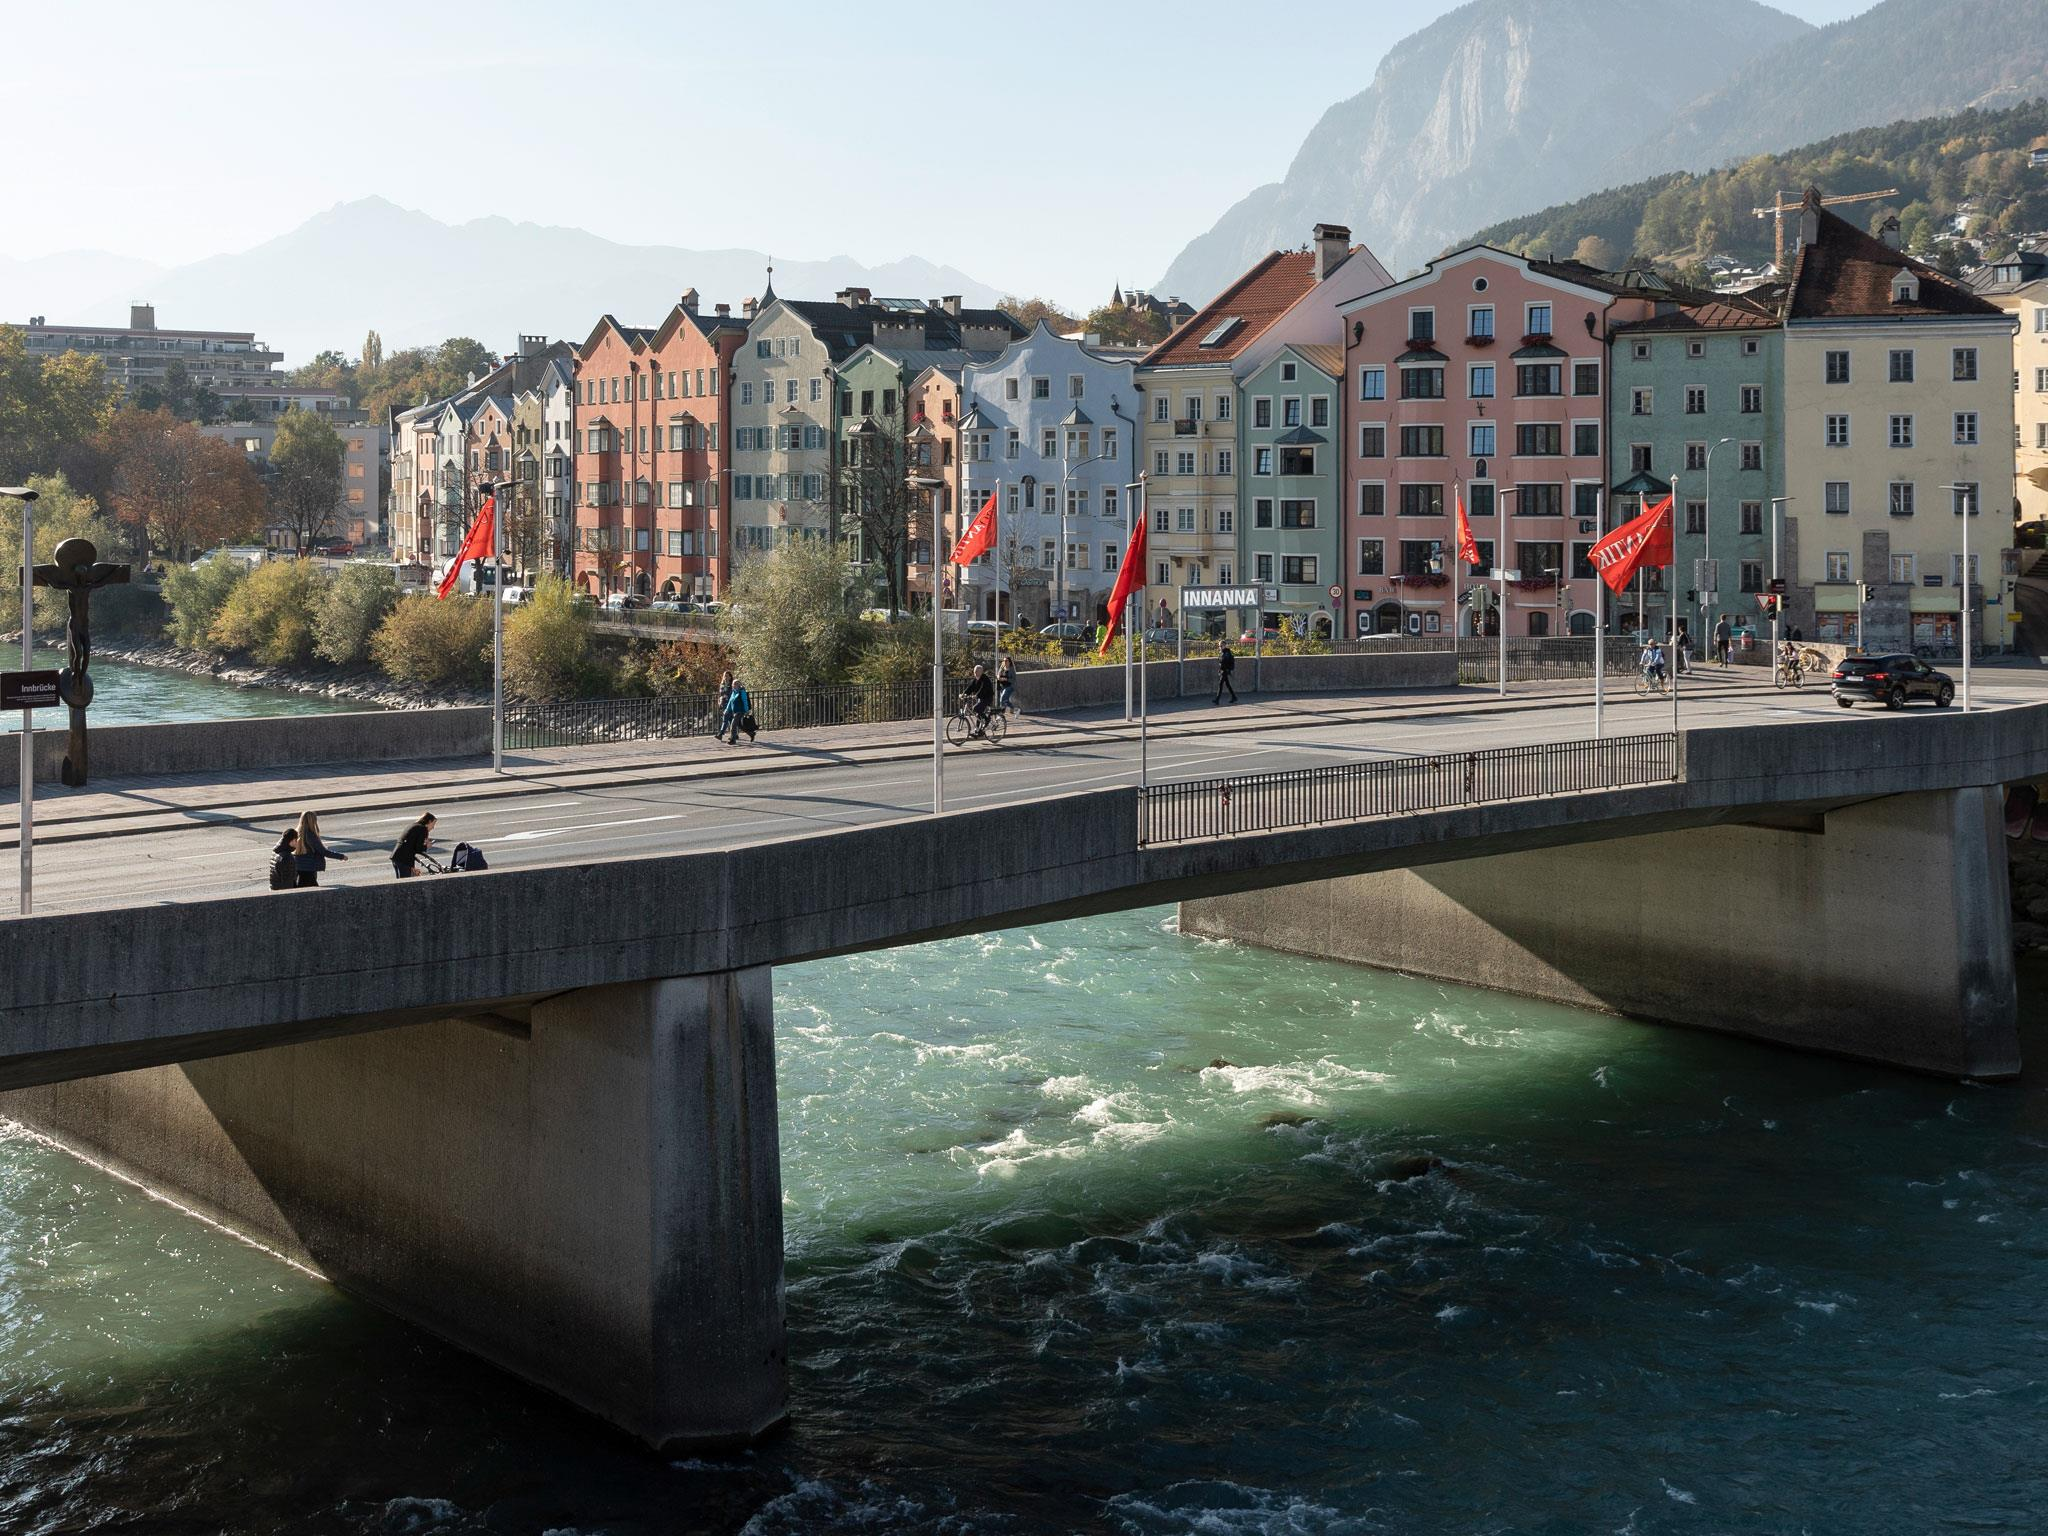 Brückengeher